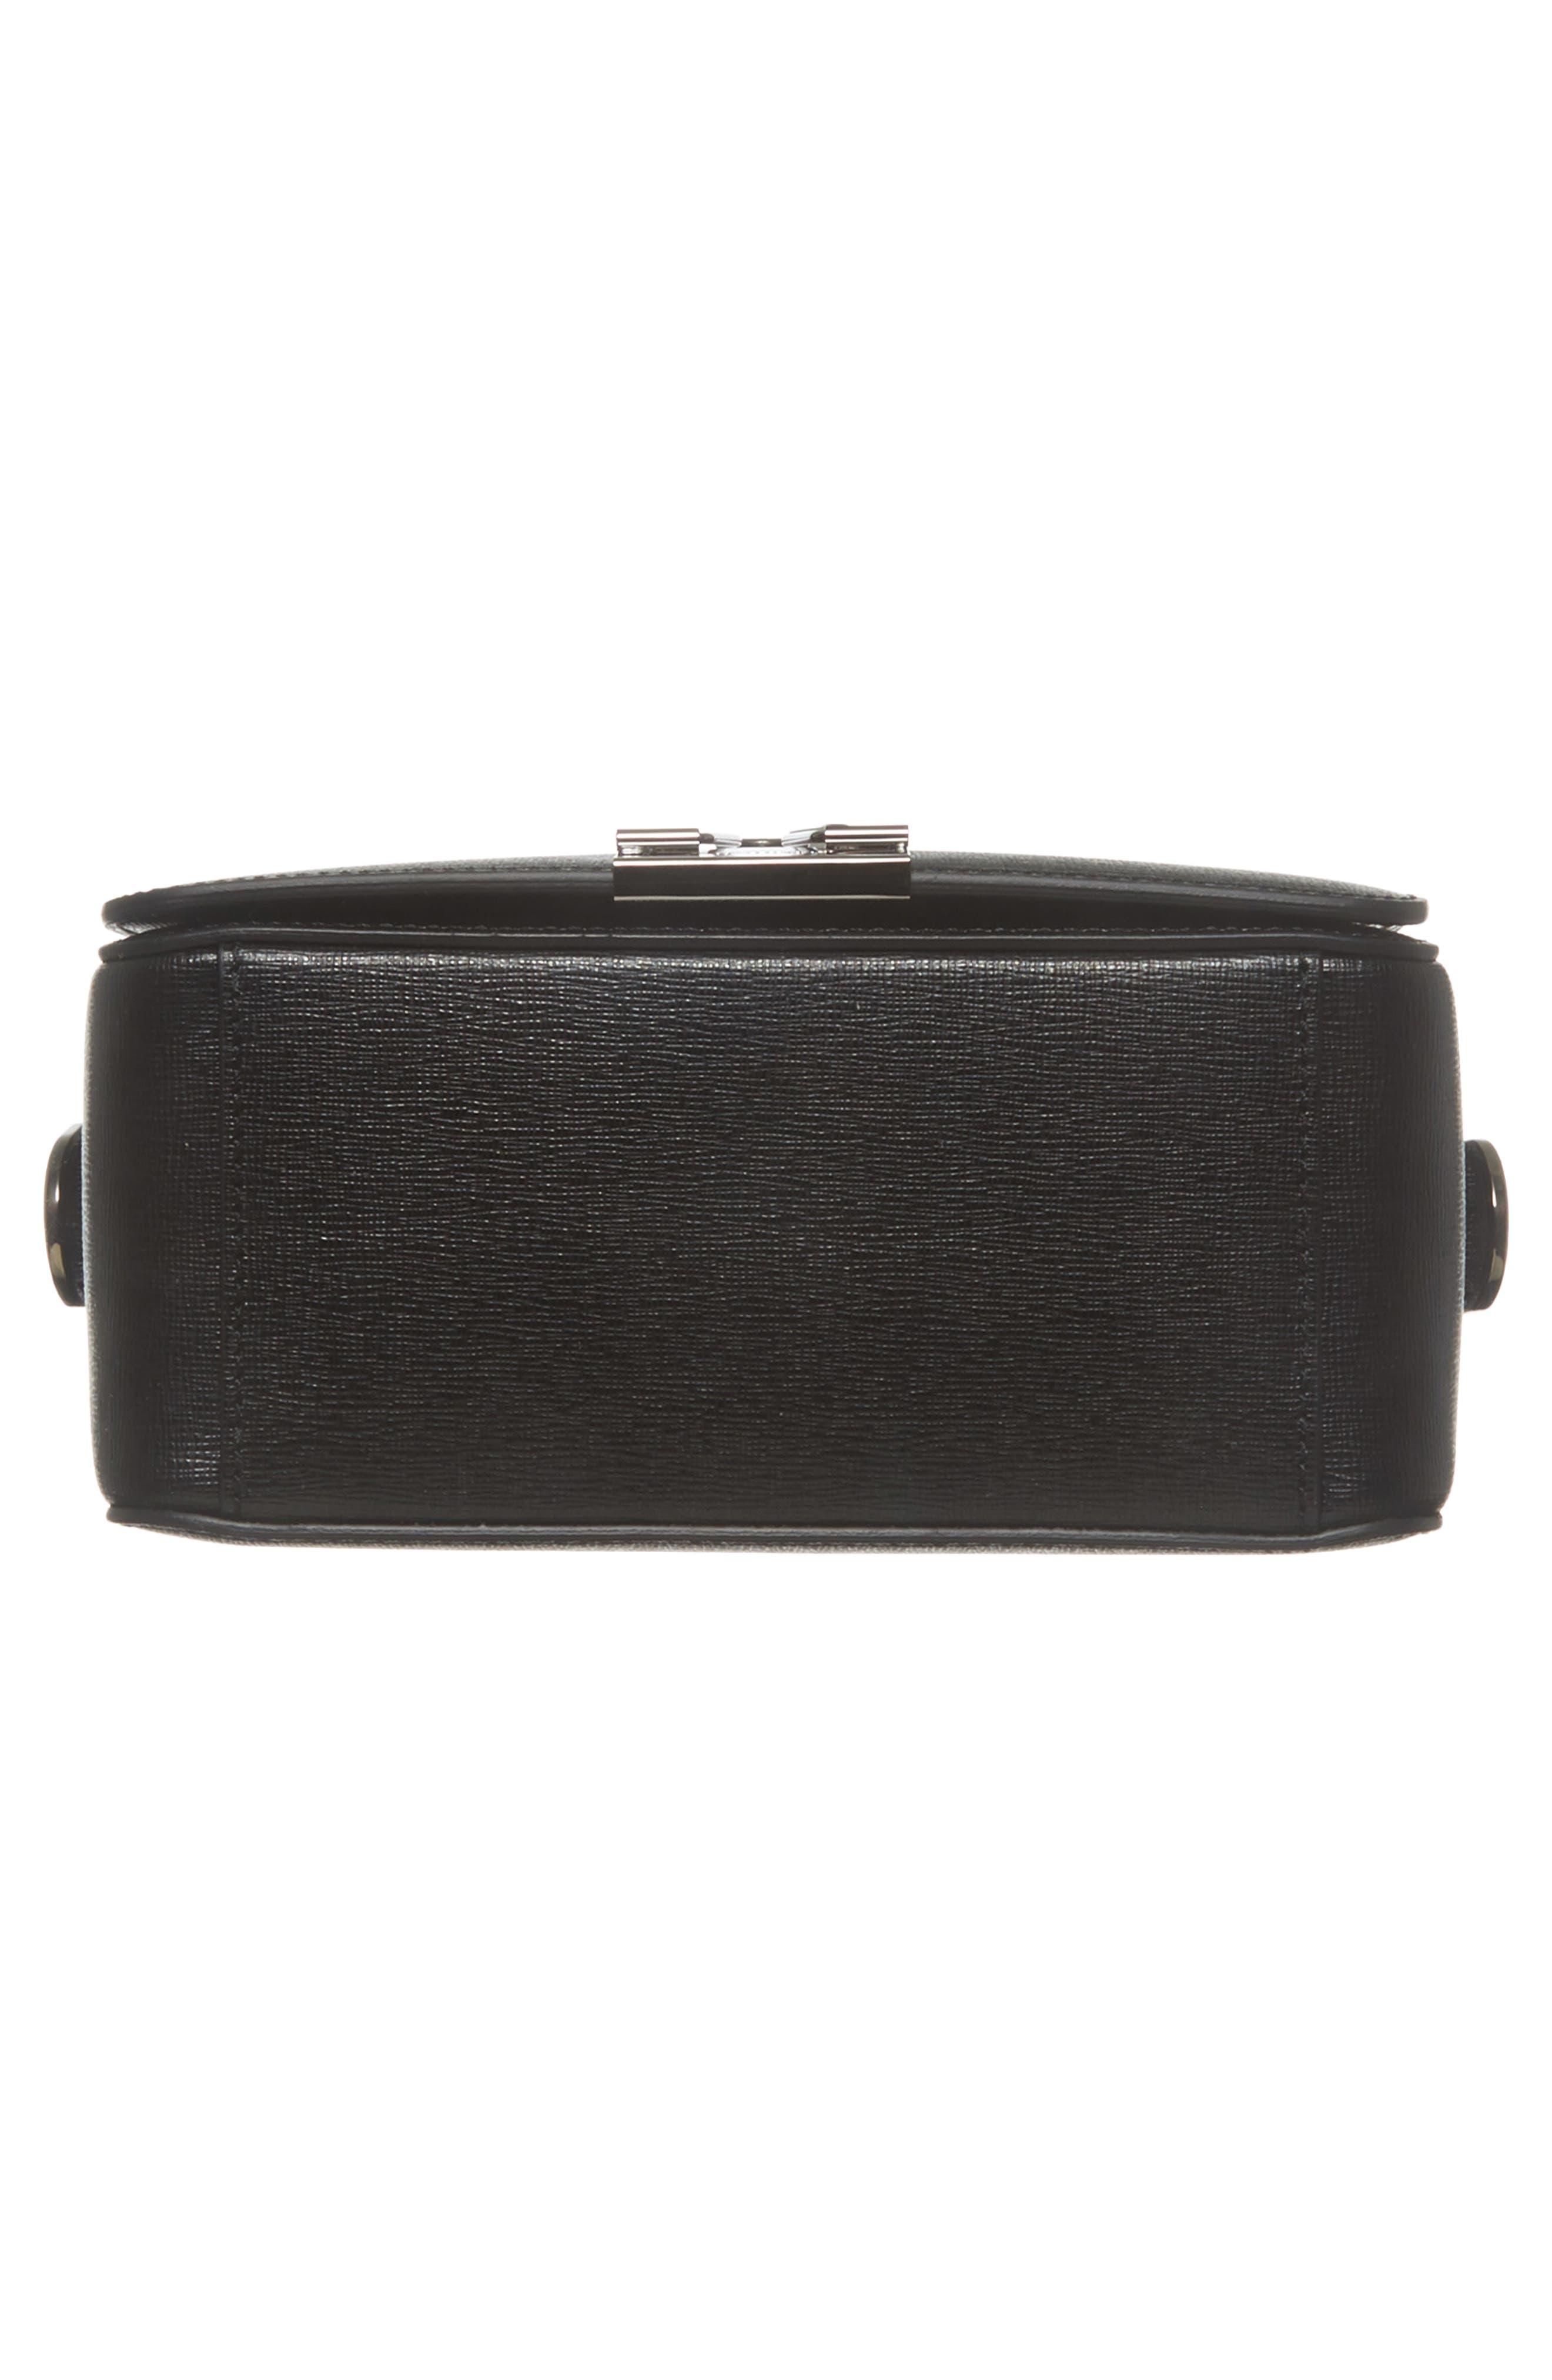 Binder Clip Leather Flap Bag,                             Alternate thumbnail 7, color,                             Black